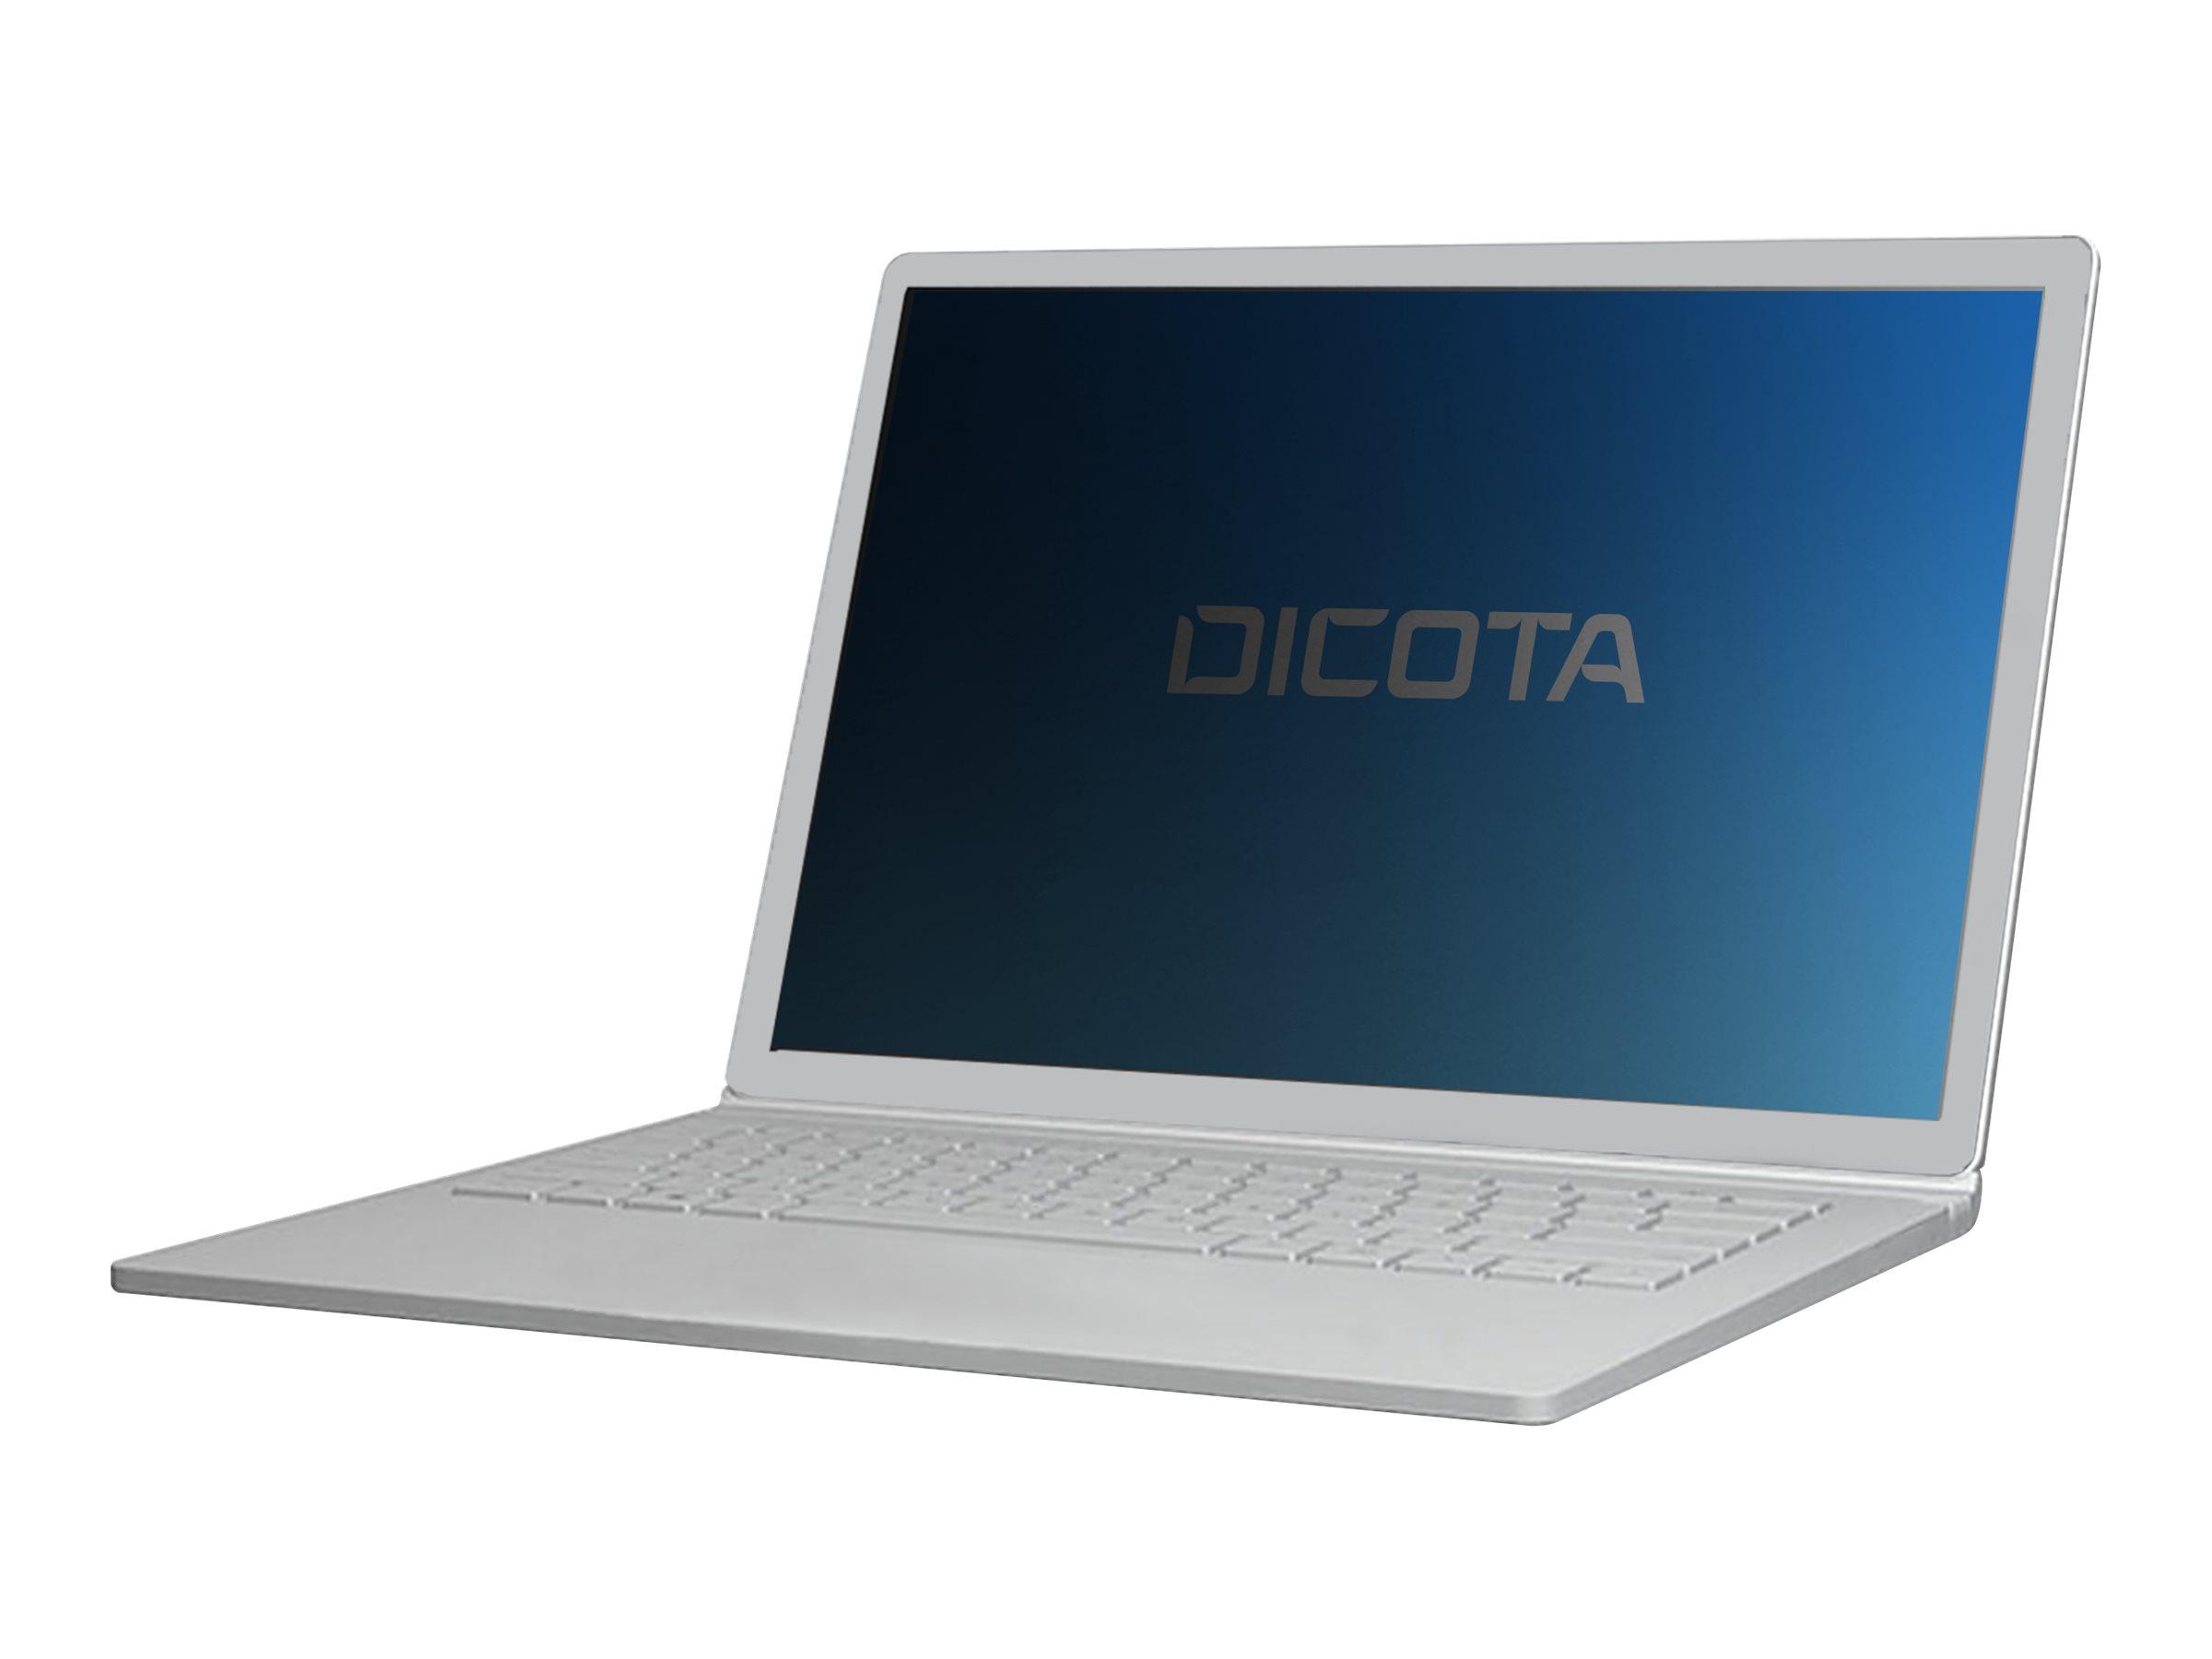 "Vorschau: Dicota Secret - Blickschutzfilter für Notebook - 2-Wege - Plug-in - 38.1 cm (15"")"